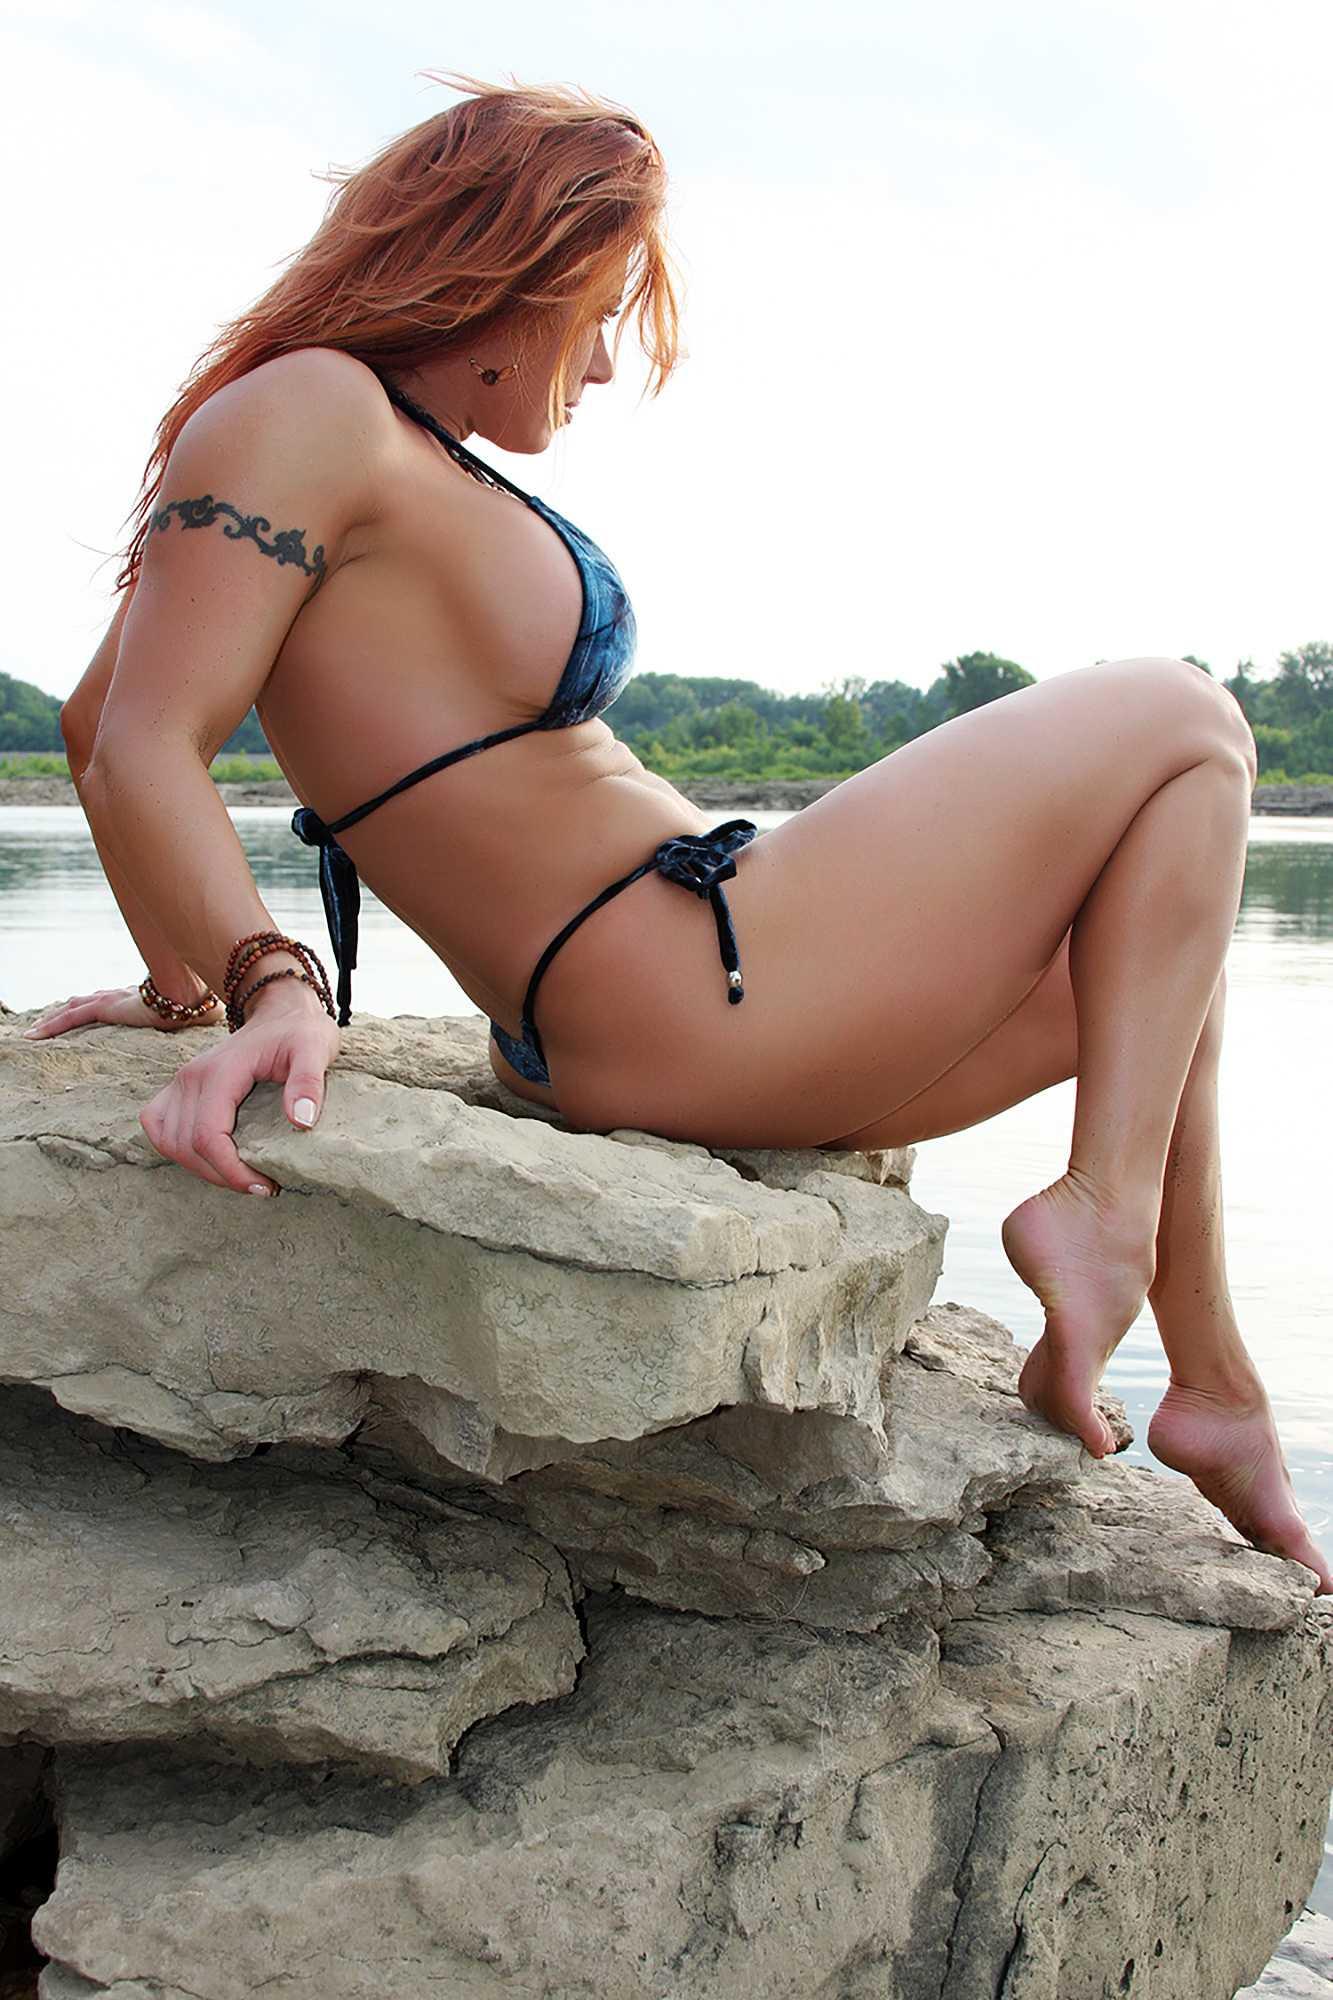 April Hunter sexy photo